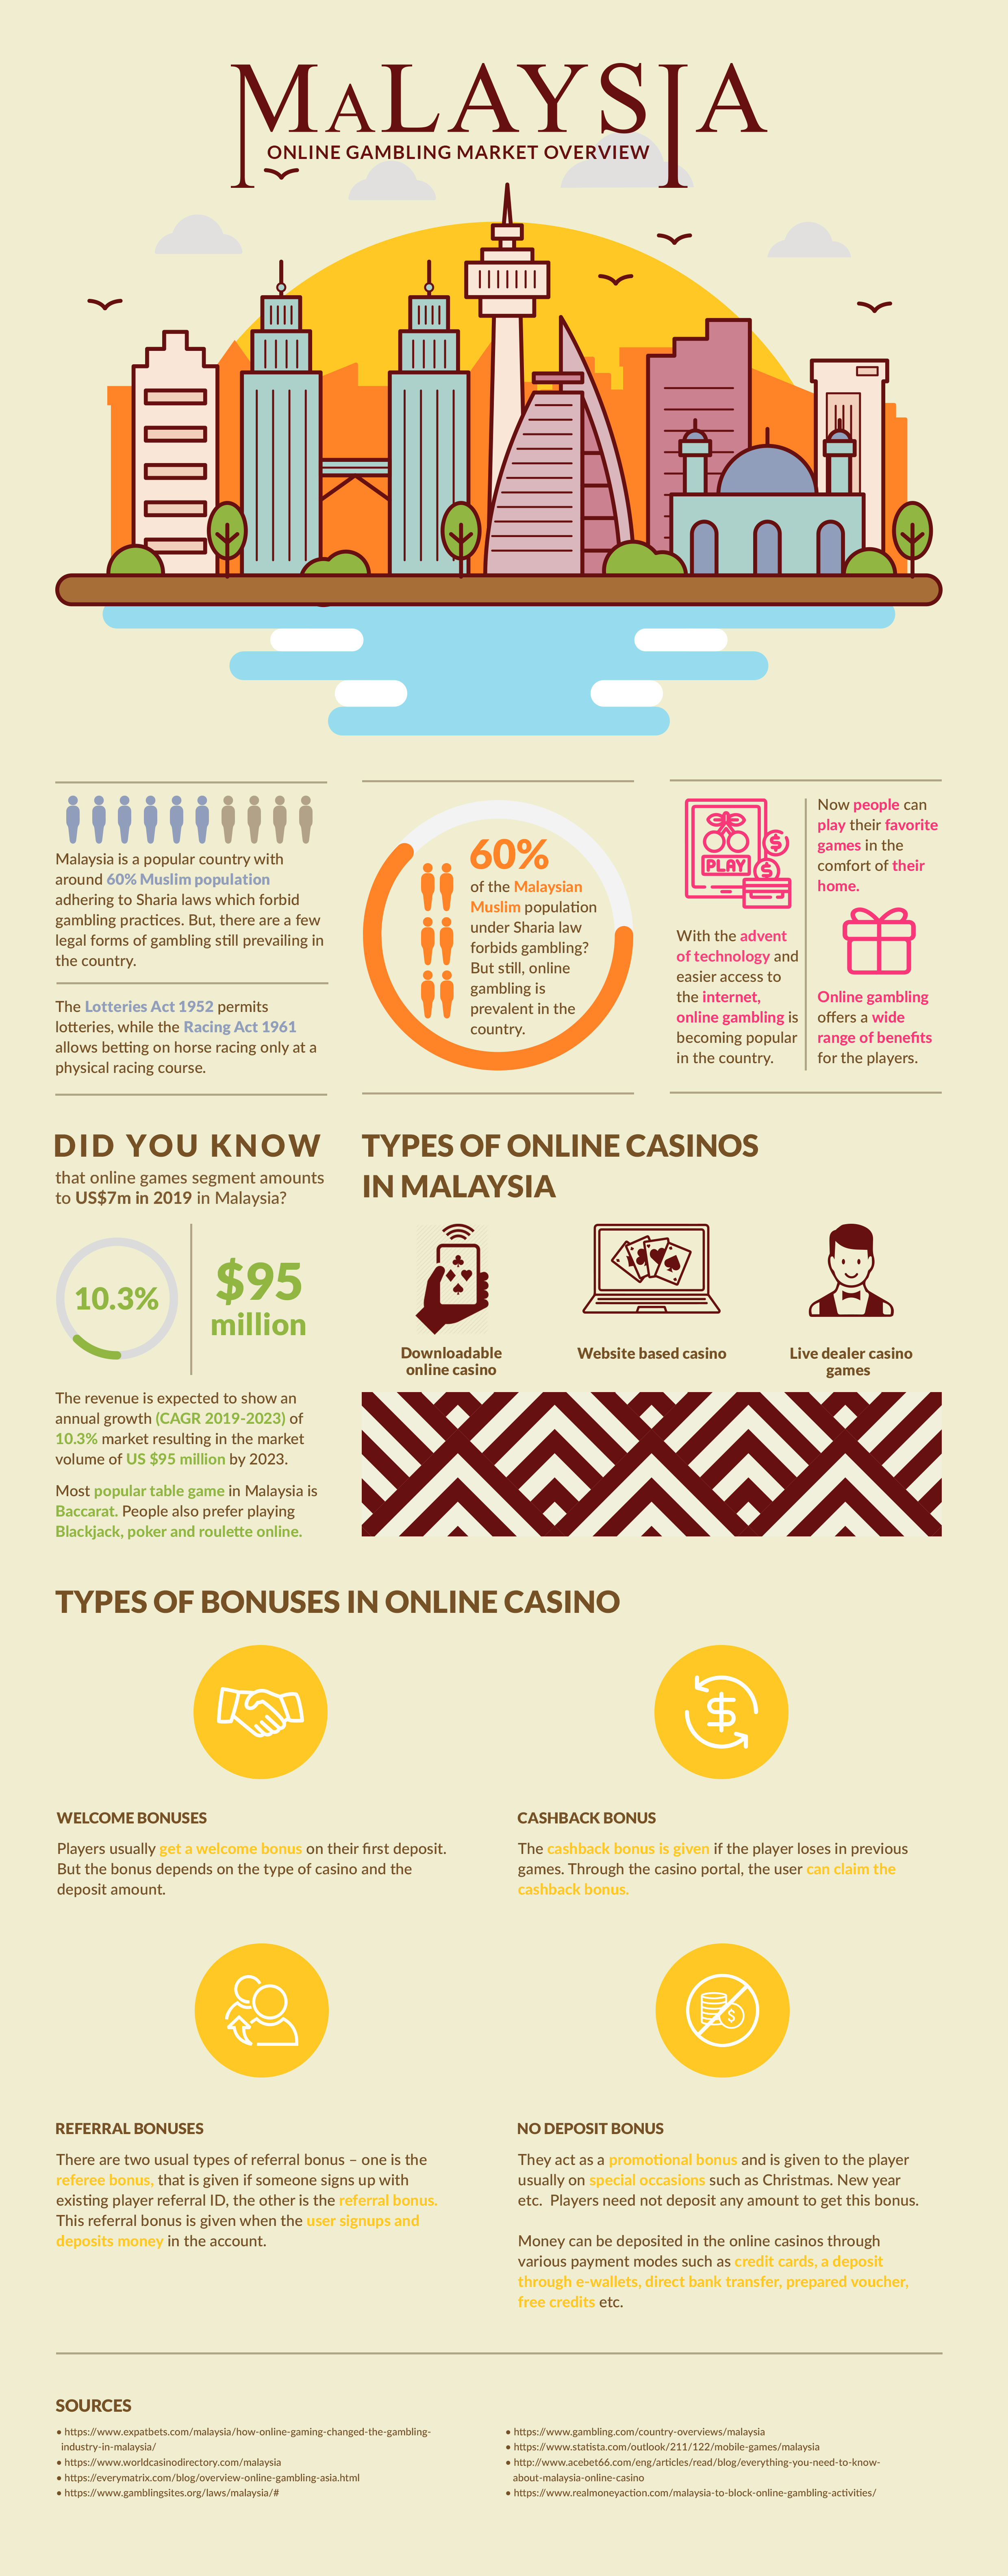 Malaysia Online Gambling Market Infographic